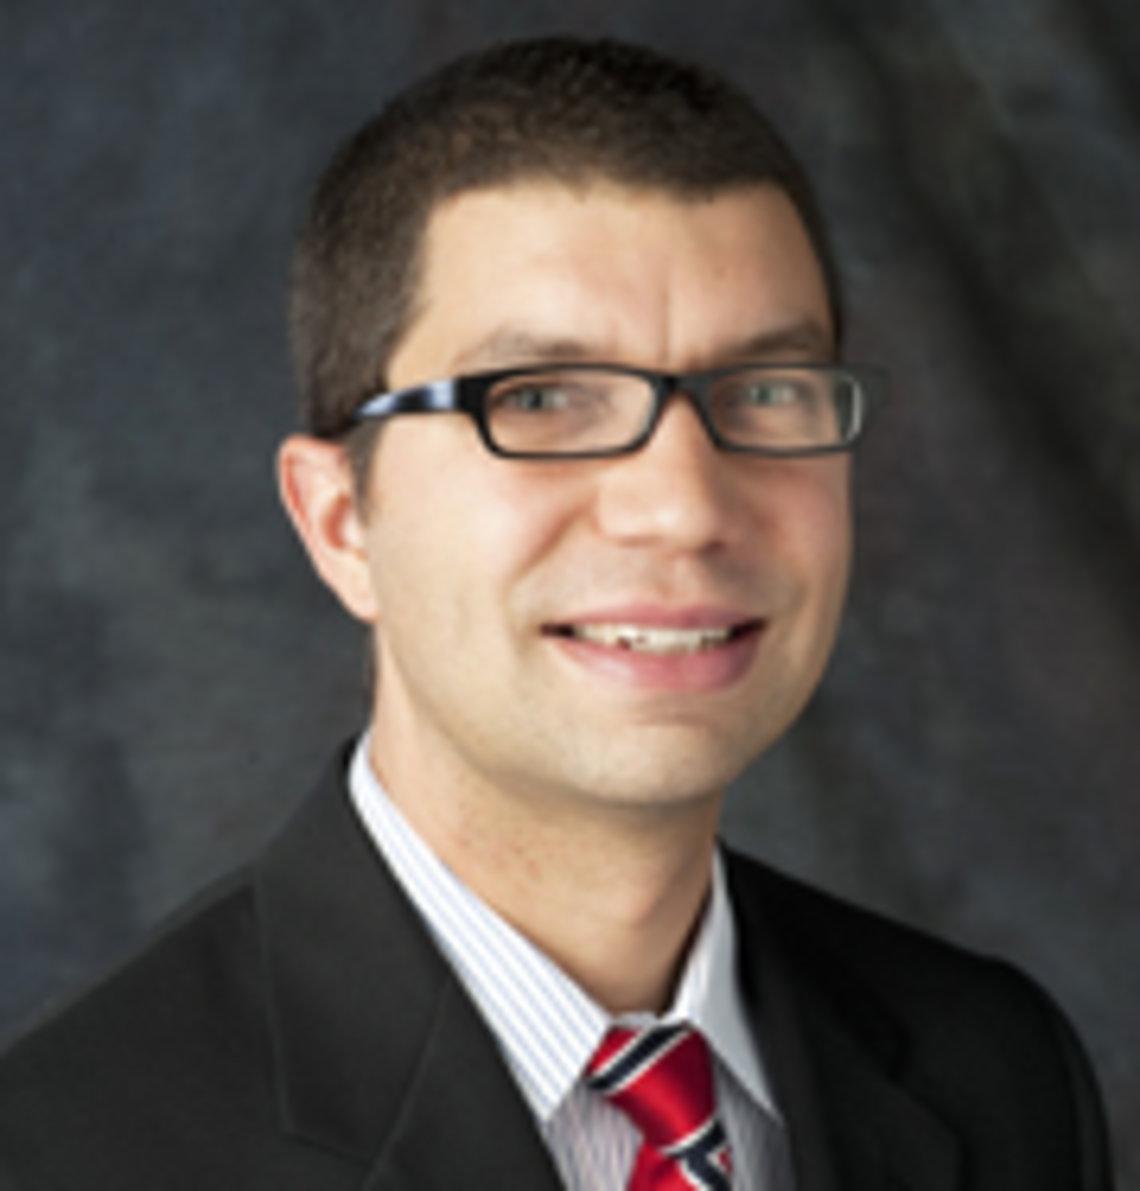 Dr. Stephen Odom